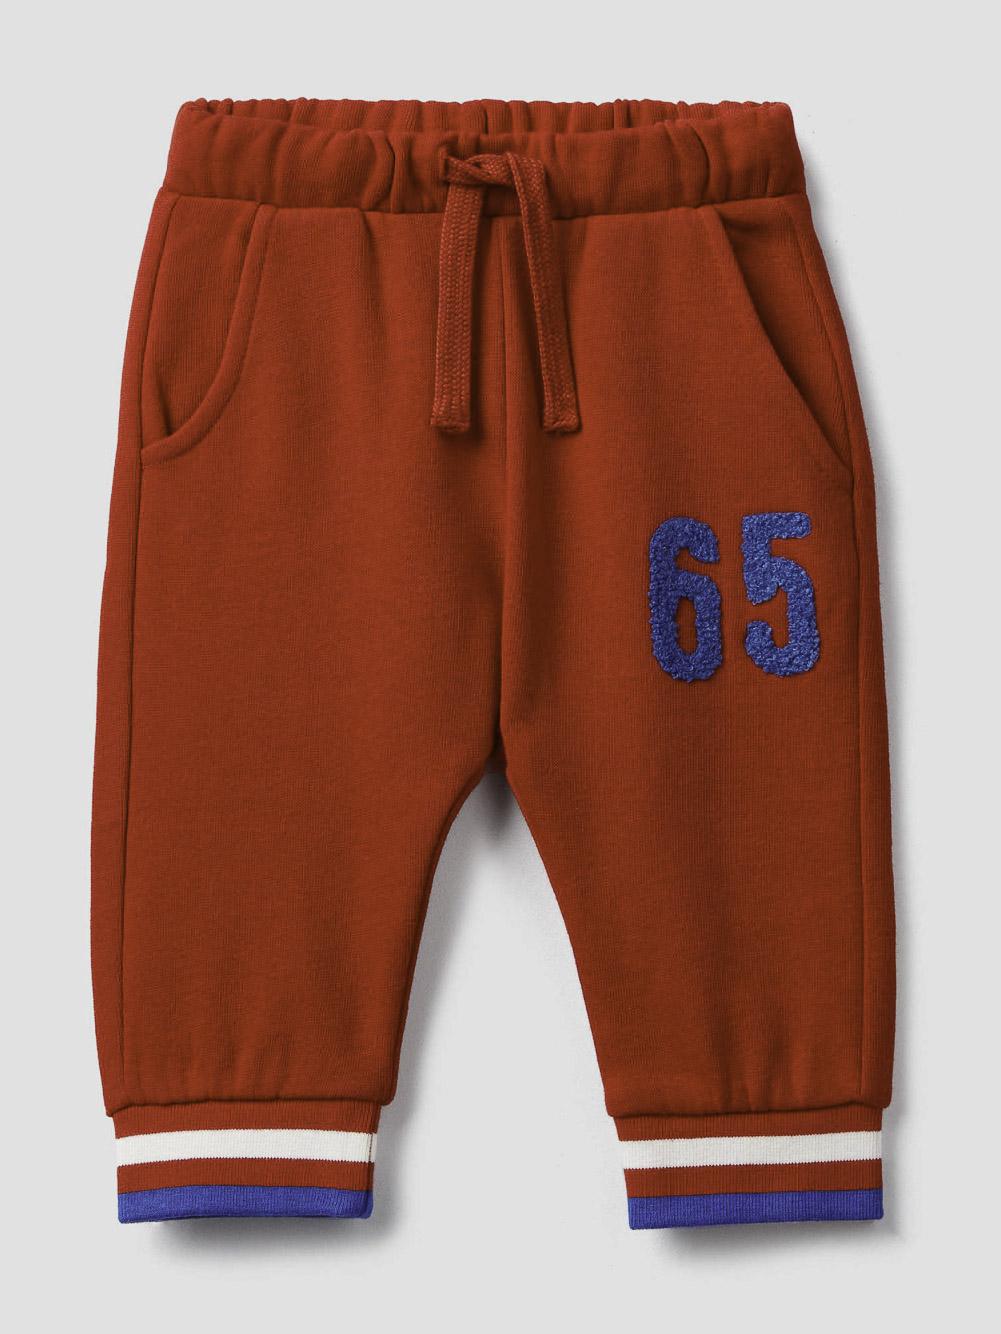 012 BENETTON Παντελόνι με κορδόνι και κέντημα 3J73I0164 20A015